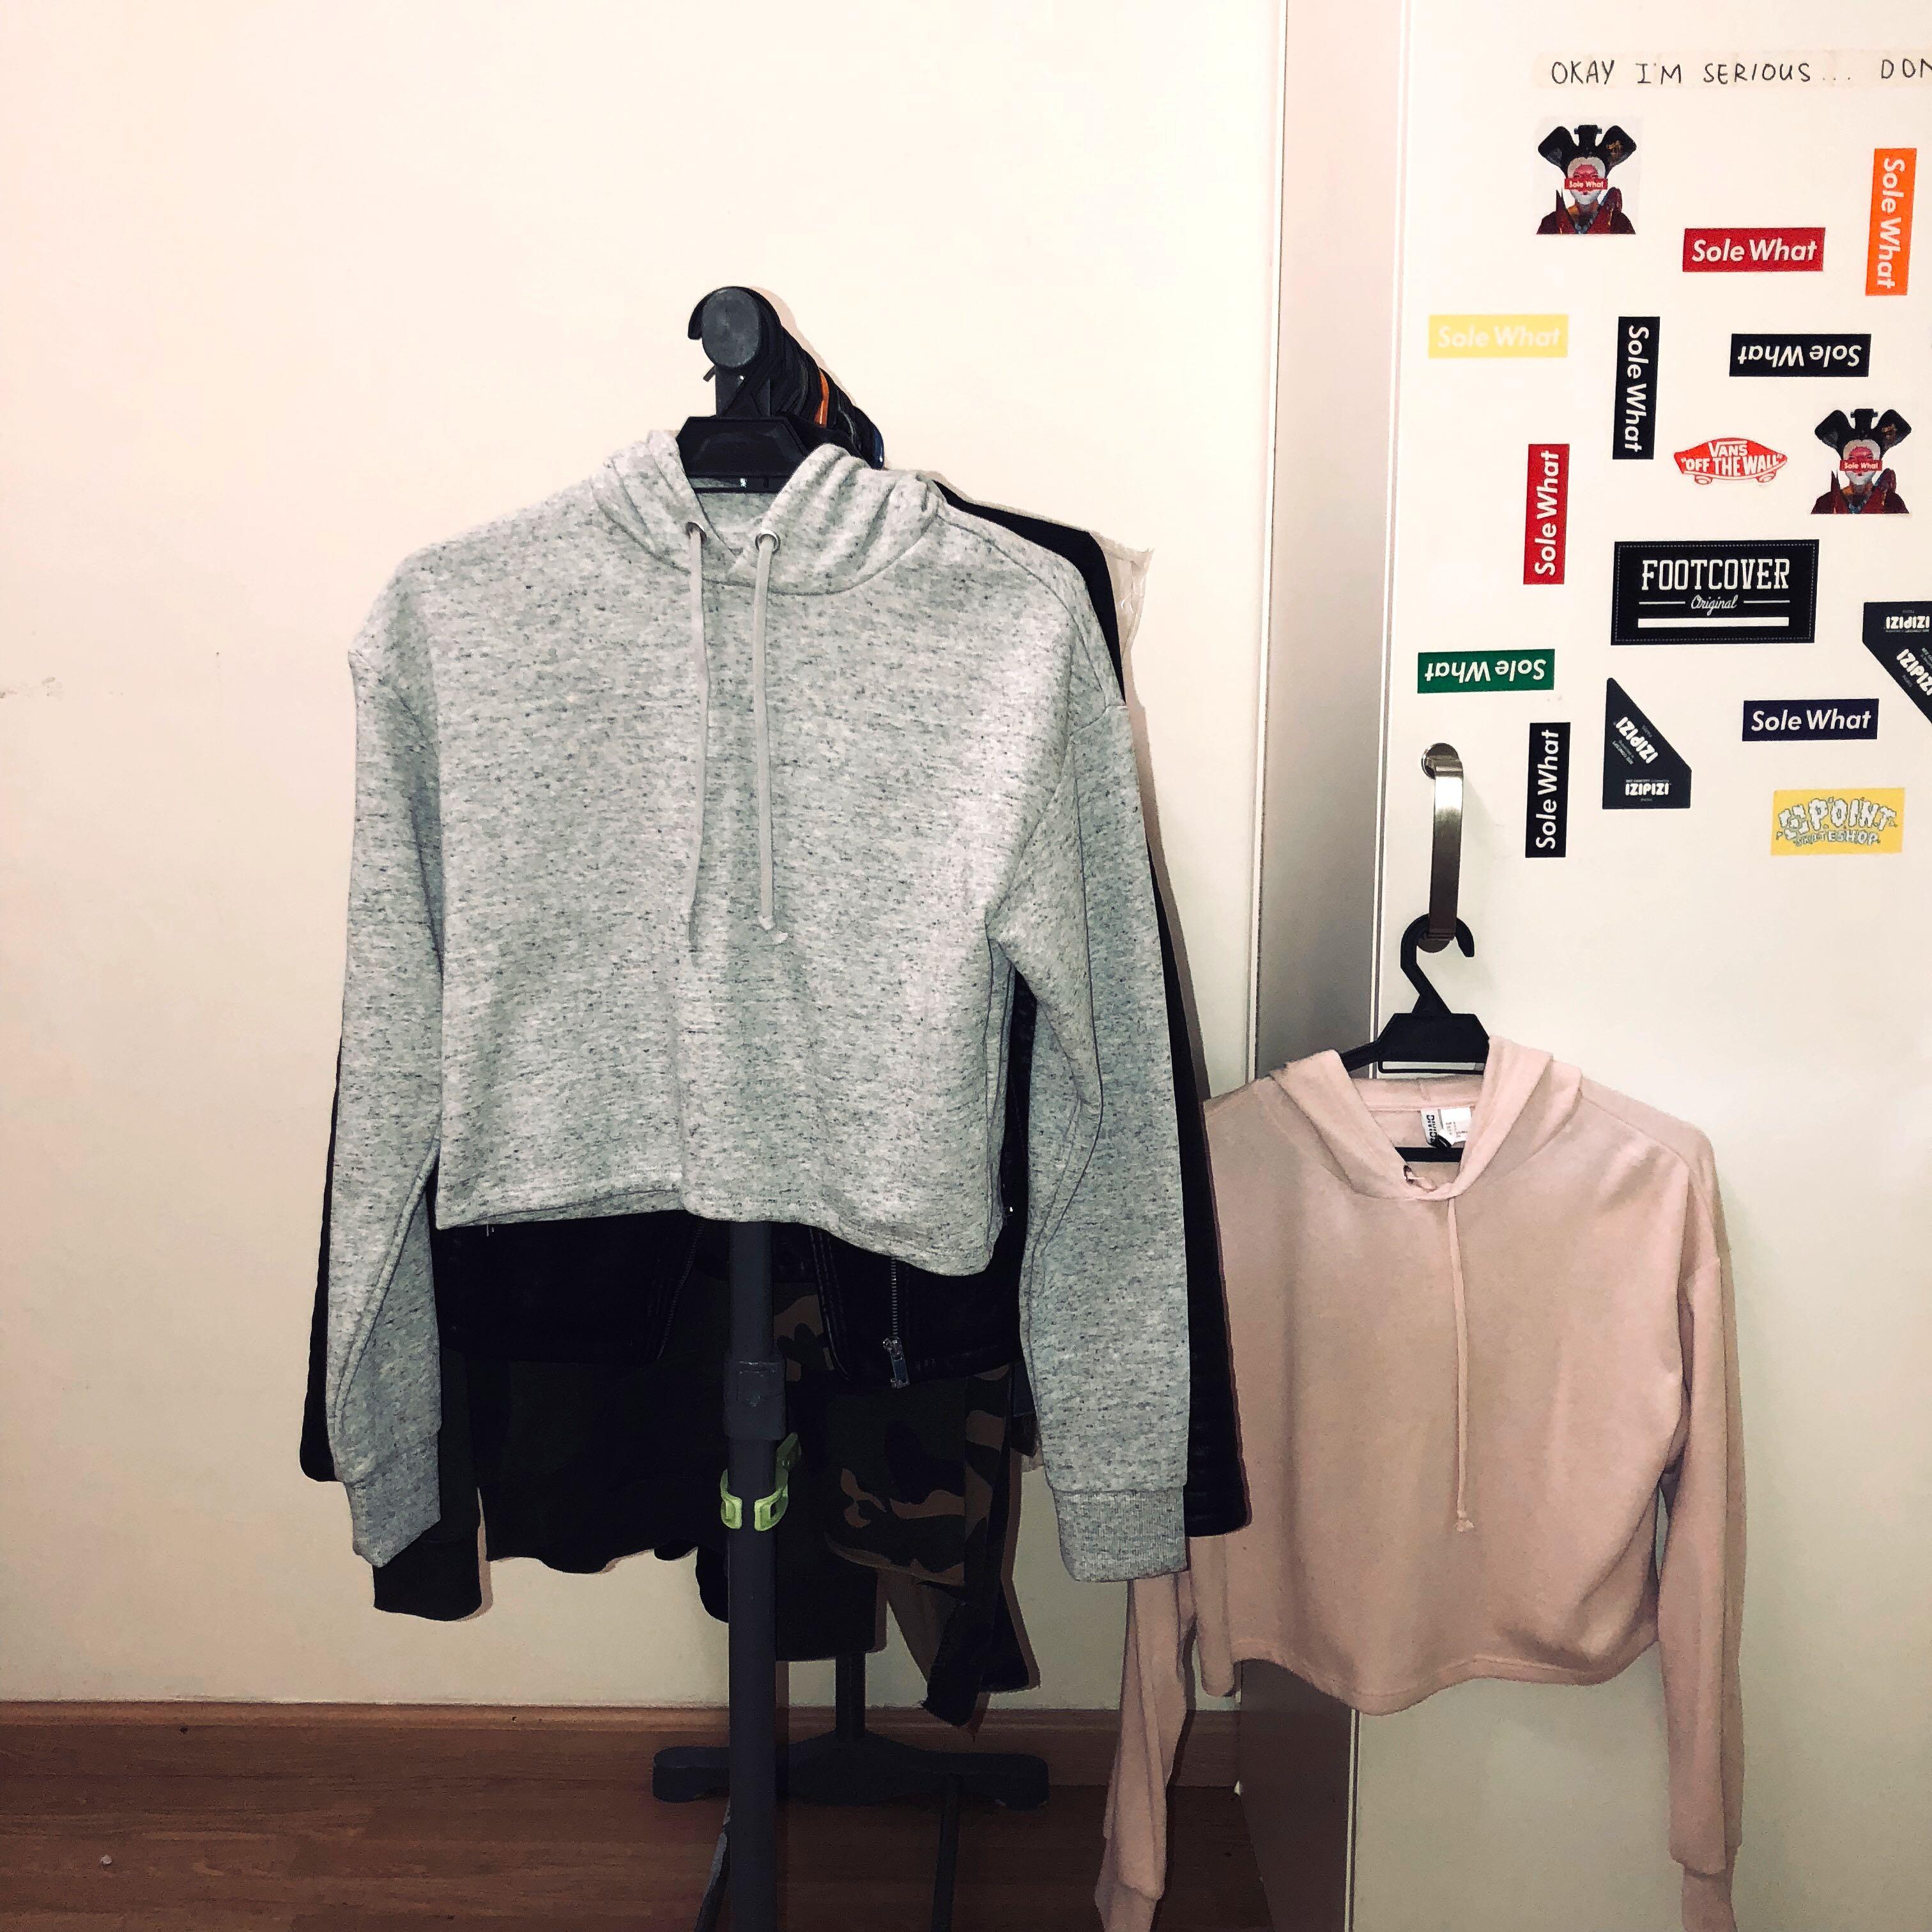 d1488a1d15 Home · Women s Fashion · Clothes · Tops. photo photo photo photo photo